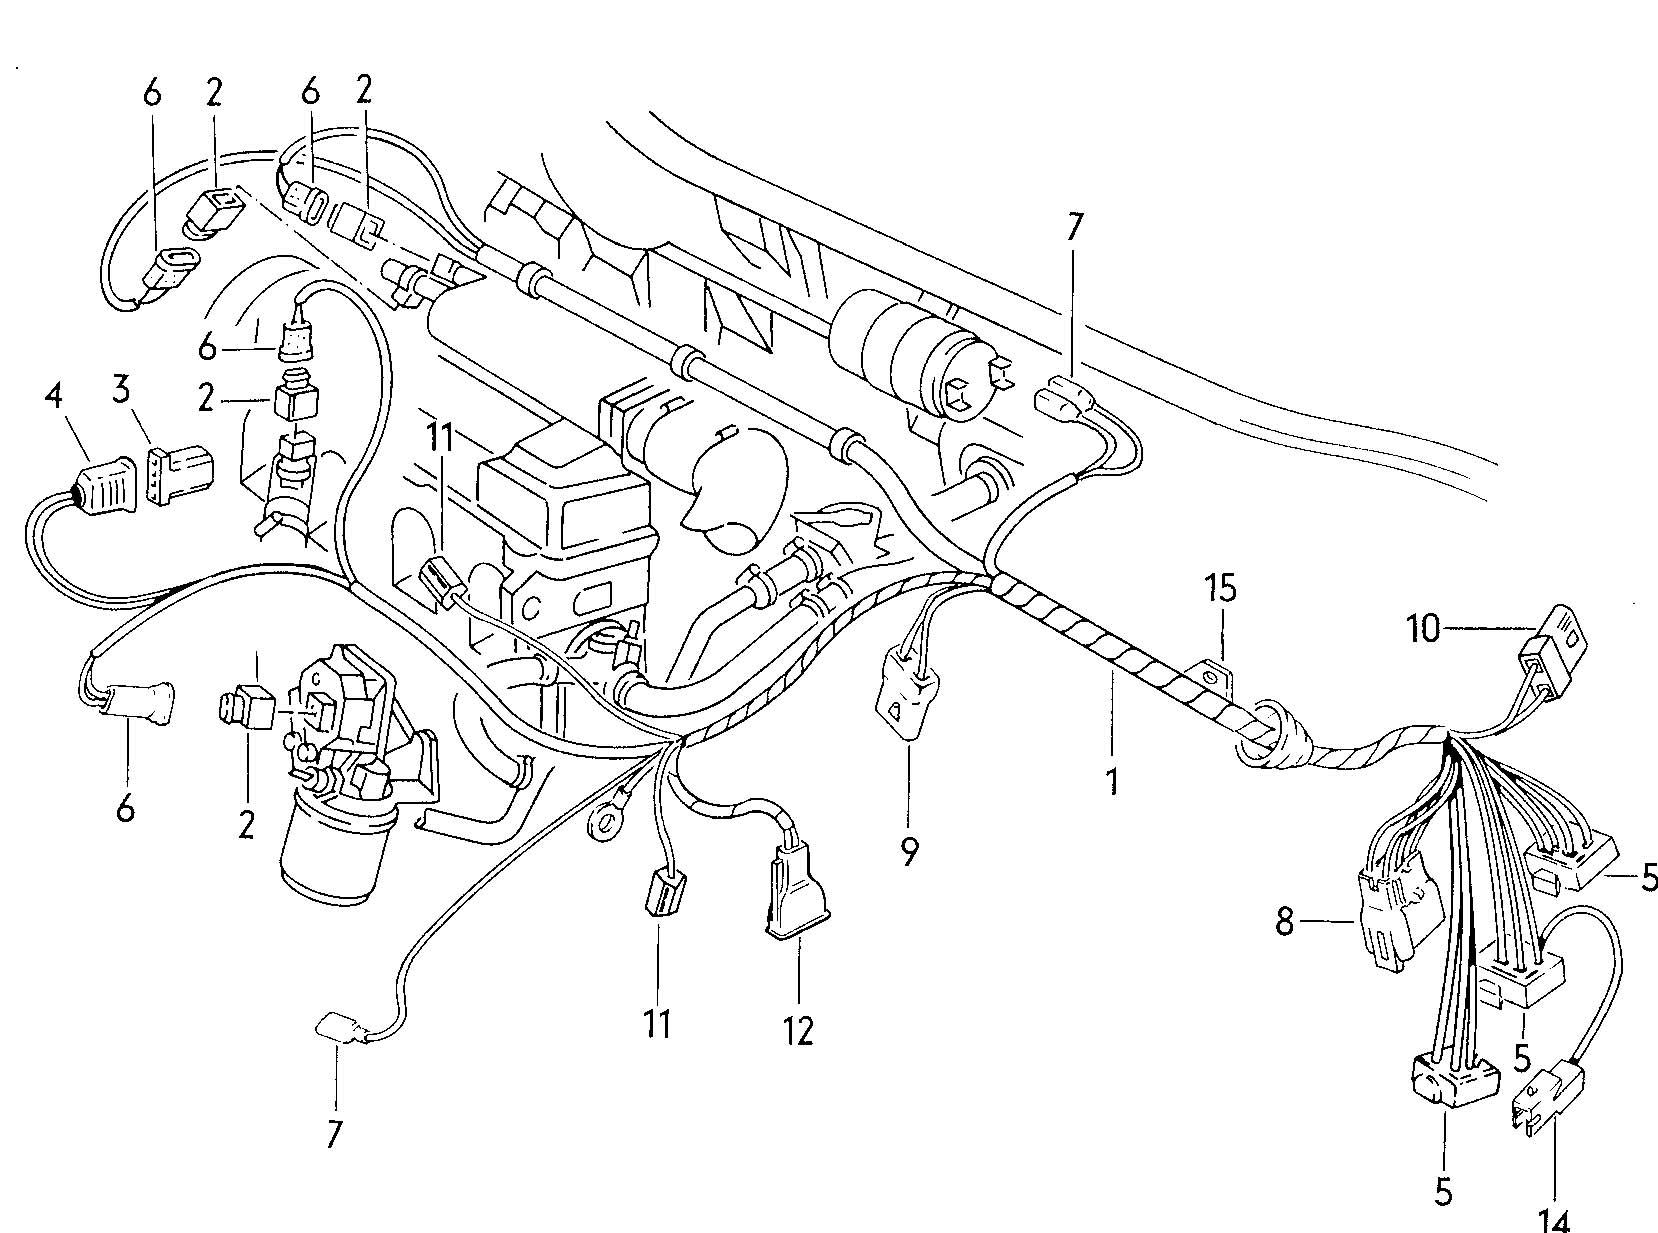 00 new beetle engine schematic